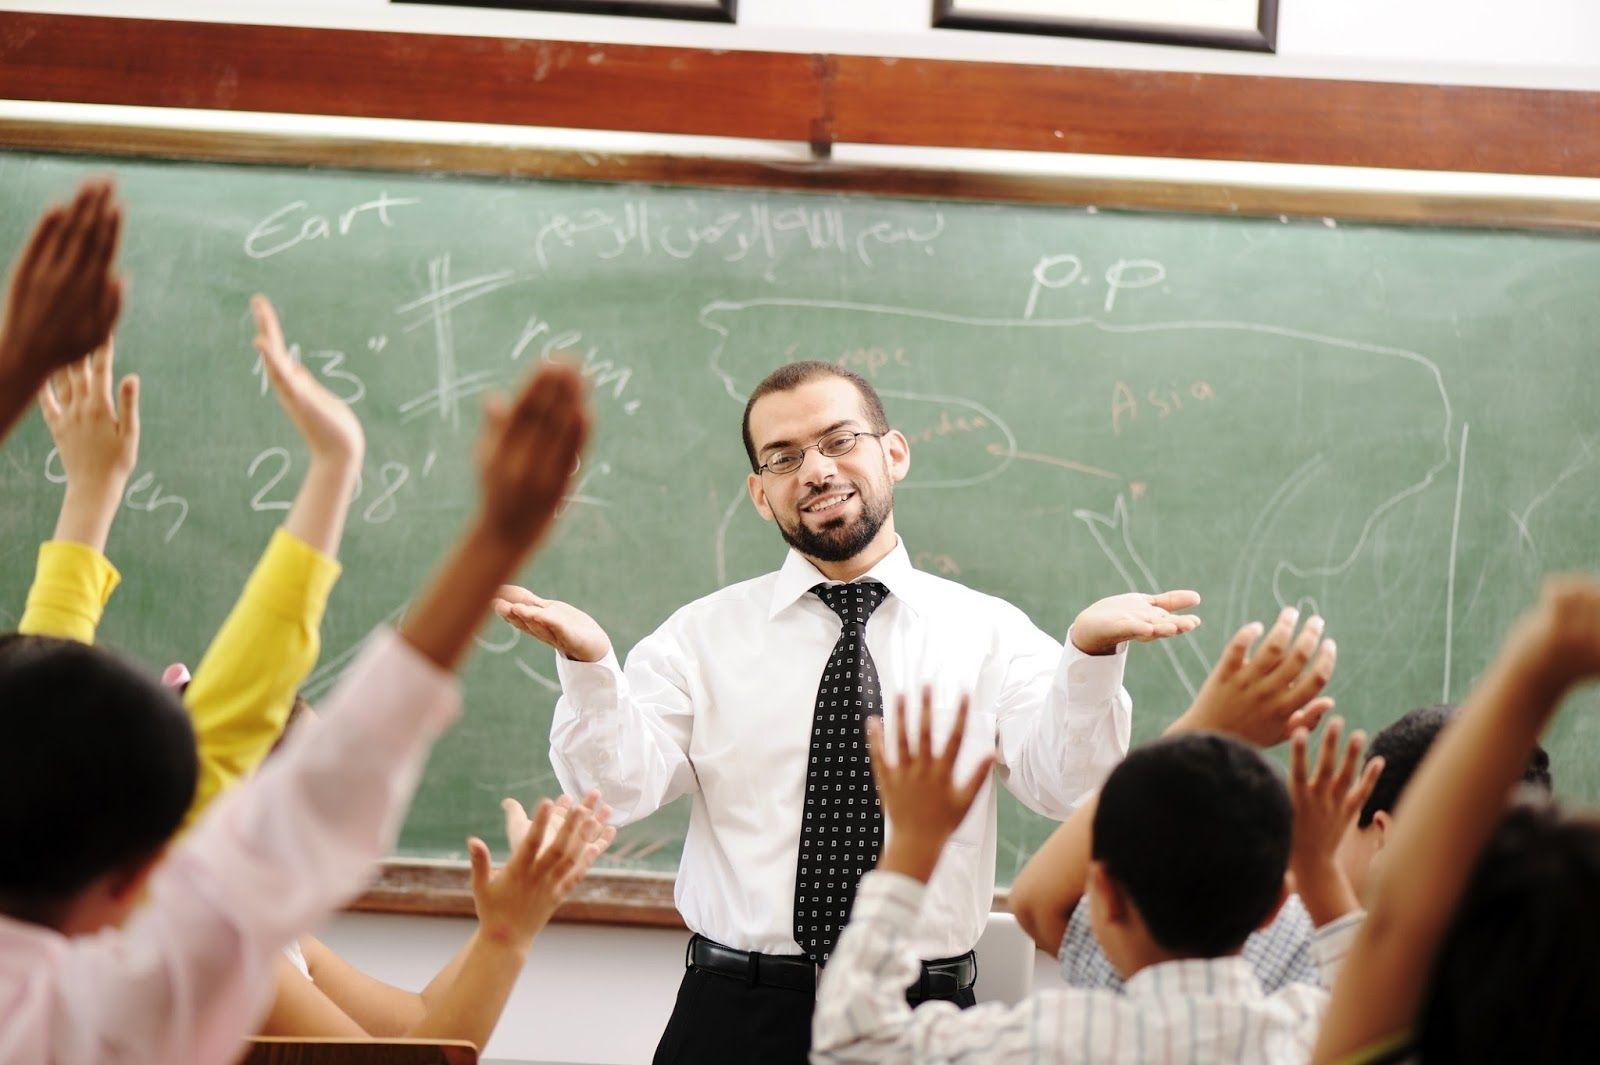 Ini Kunci Sukses Para Pendidik Dengan Mengikuti Artikel